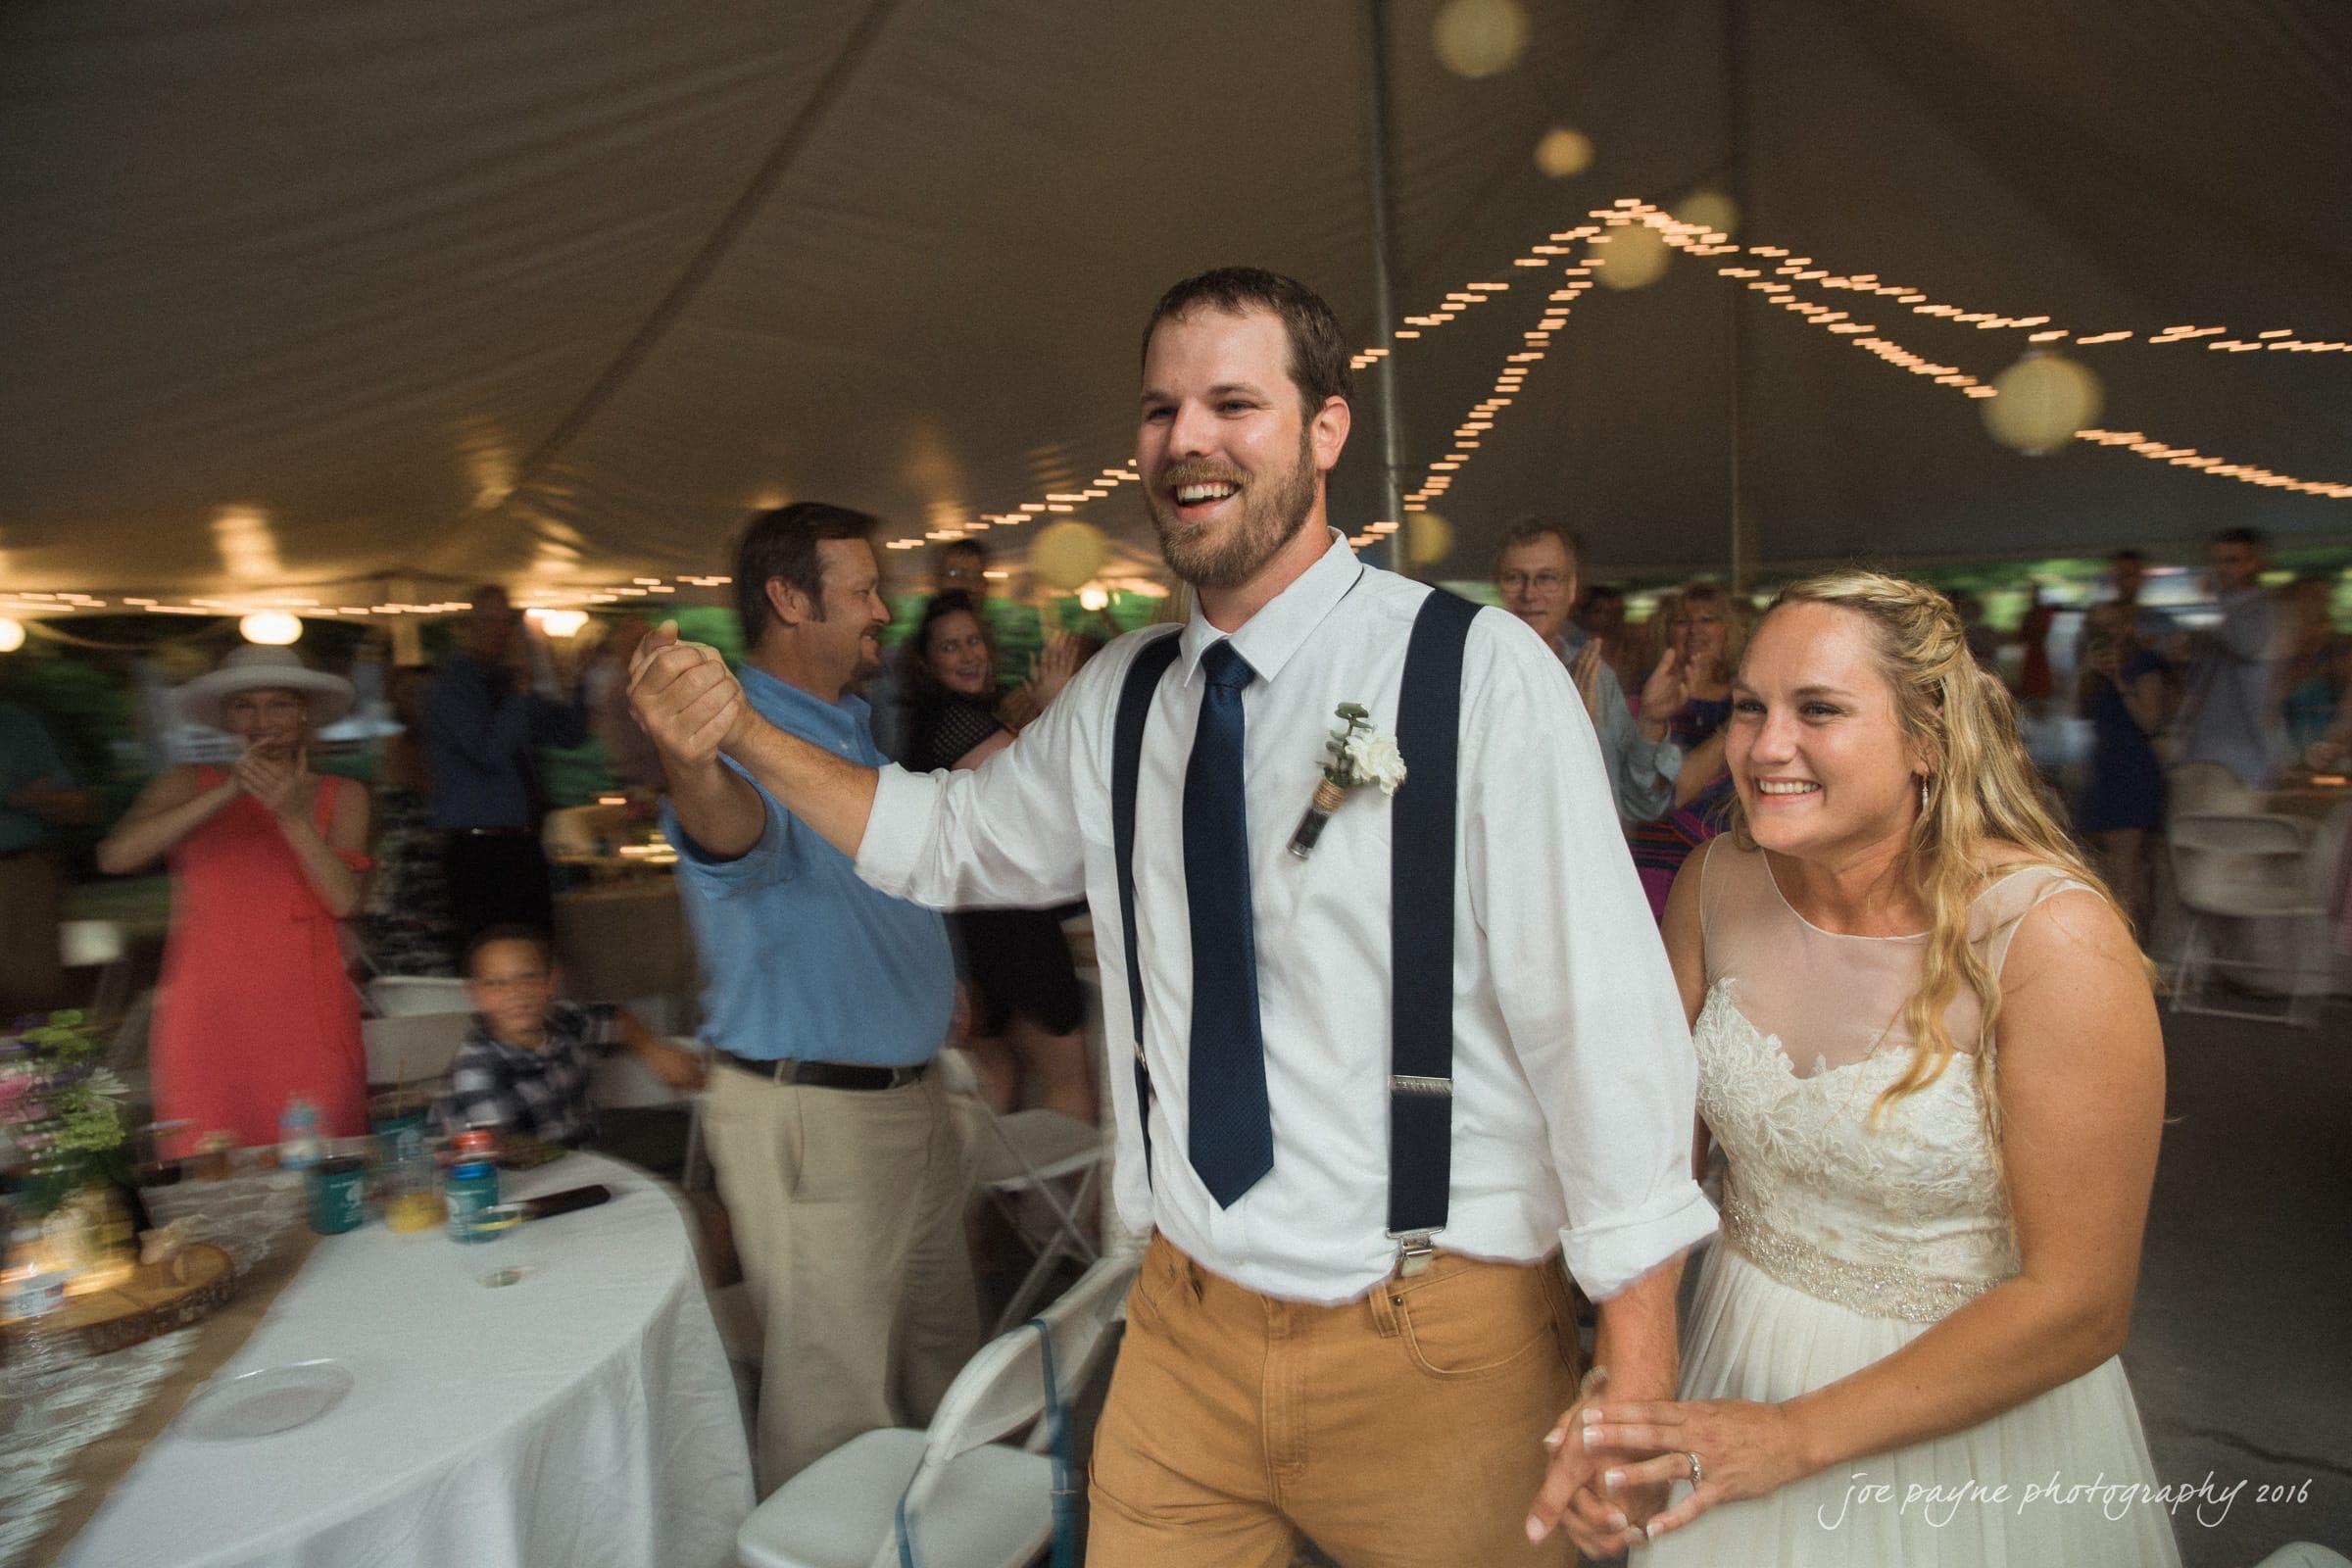 New Bern Wedding Photography - Jessica & Brinson-49